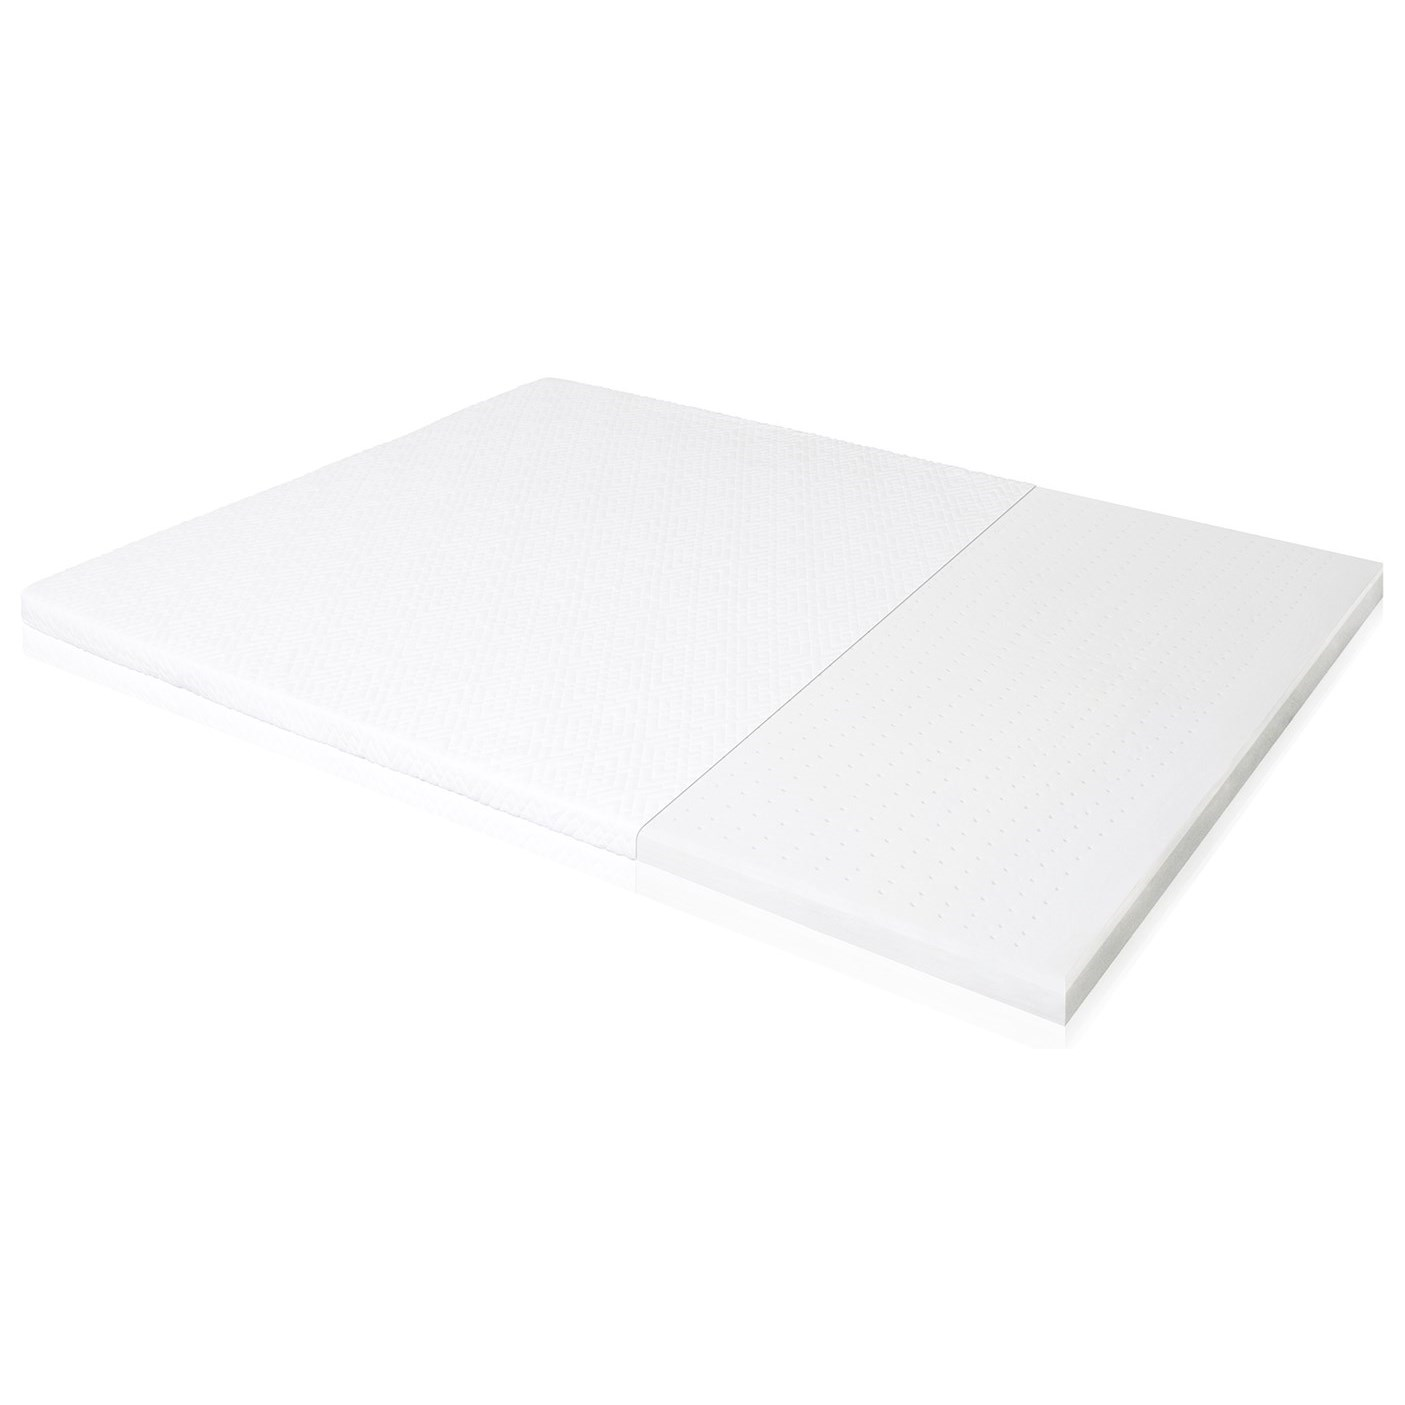 "Latex Foam Twin XL 2"" Latex Foam Mattress Topper by Malouf at Home Furnishings Direct"